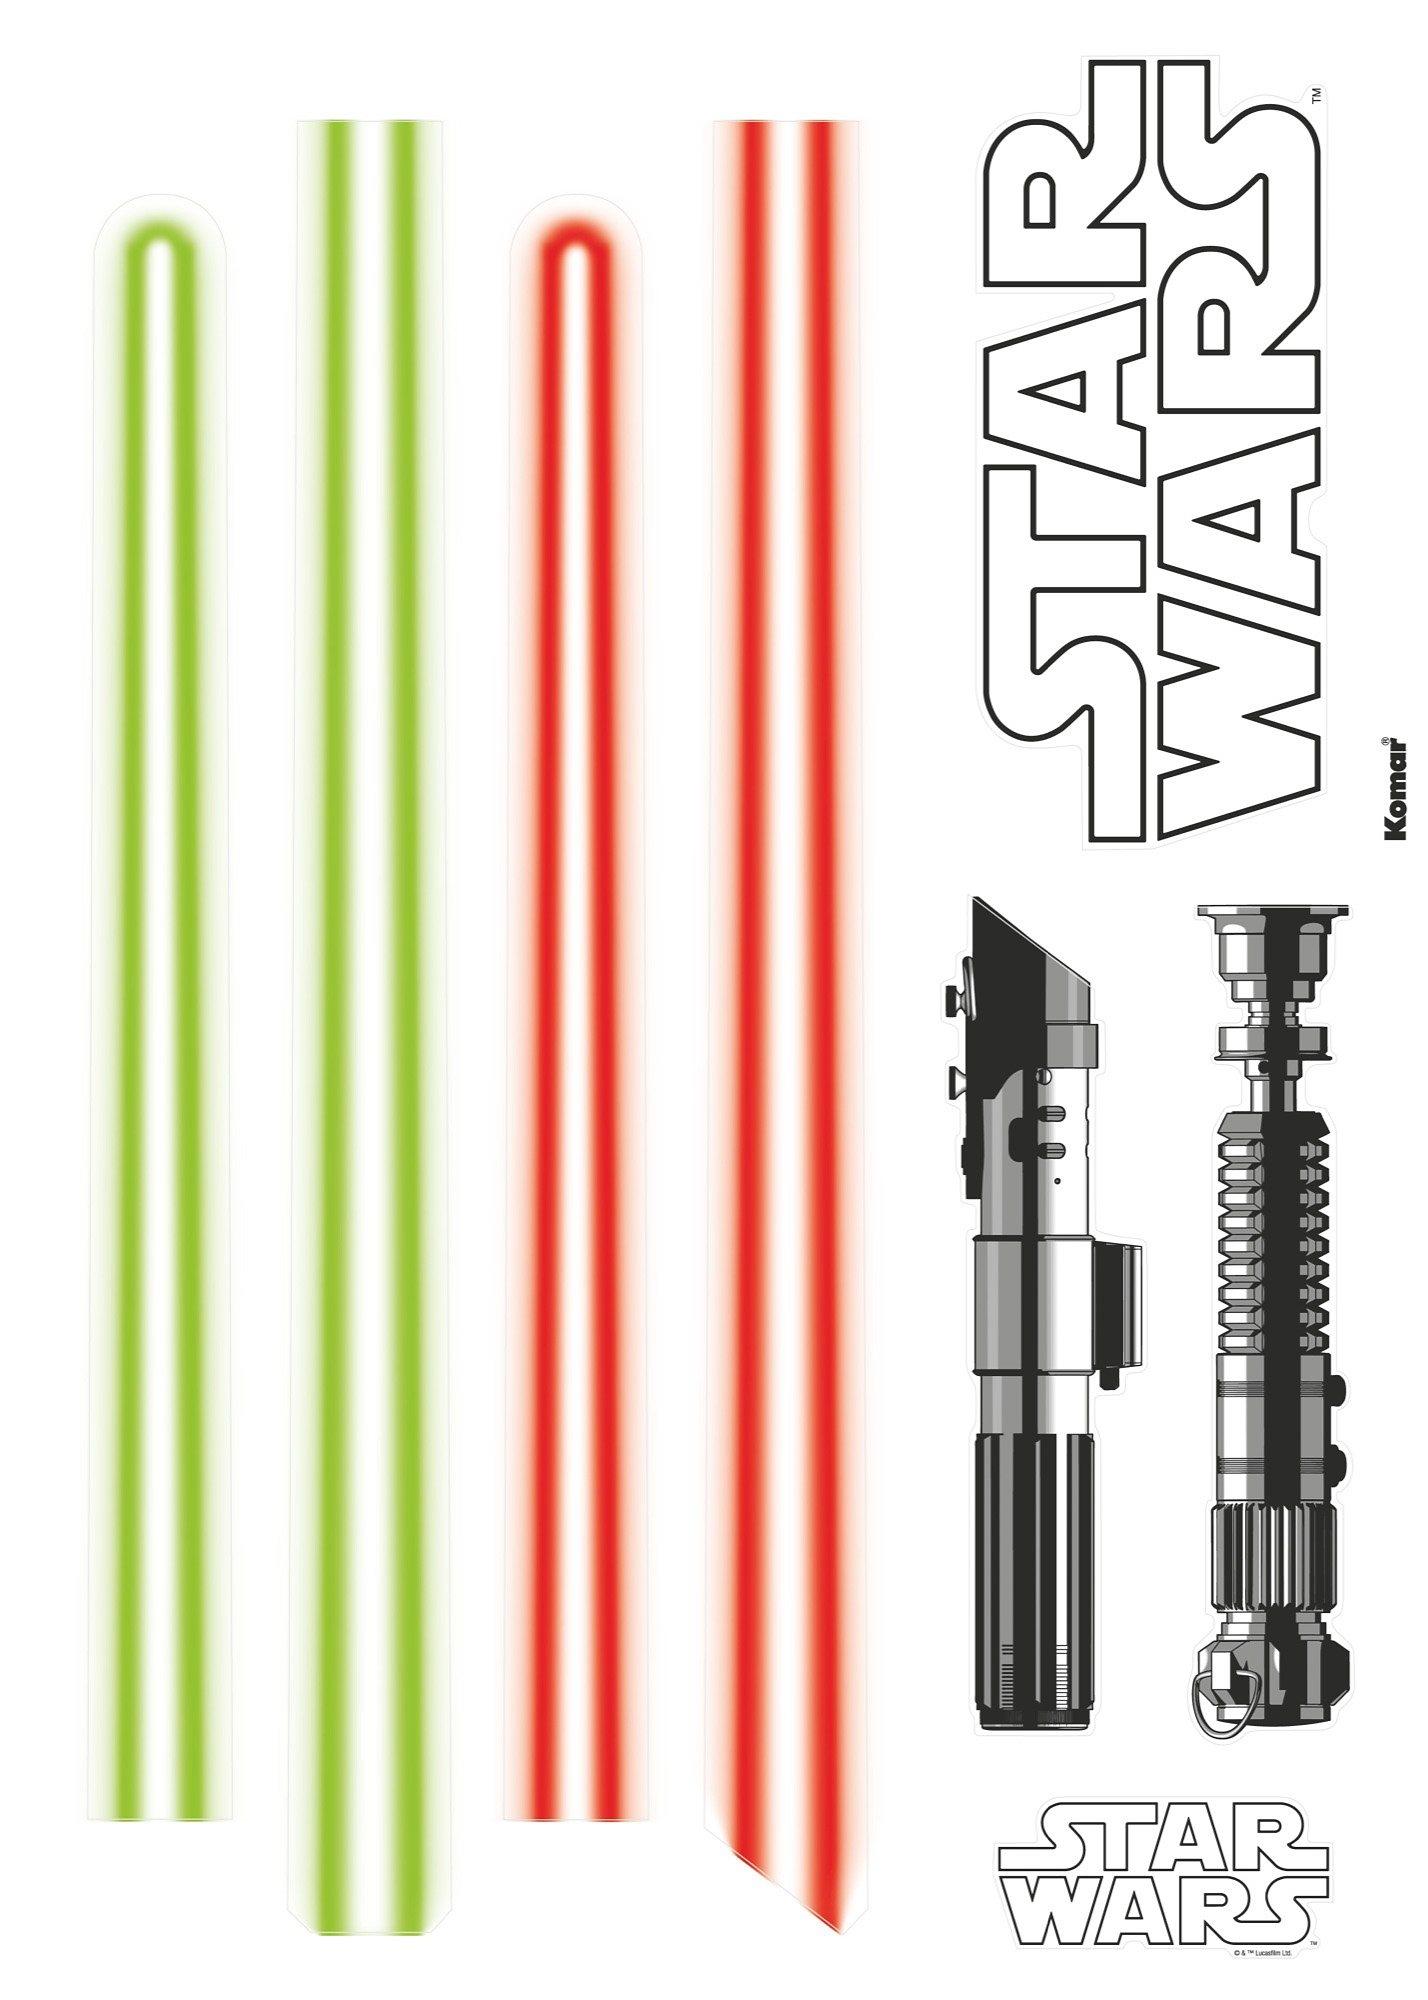 Wandsticker, , »Star Wars Lightsaber«, 50/70 cm